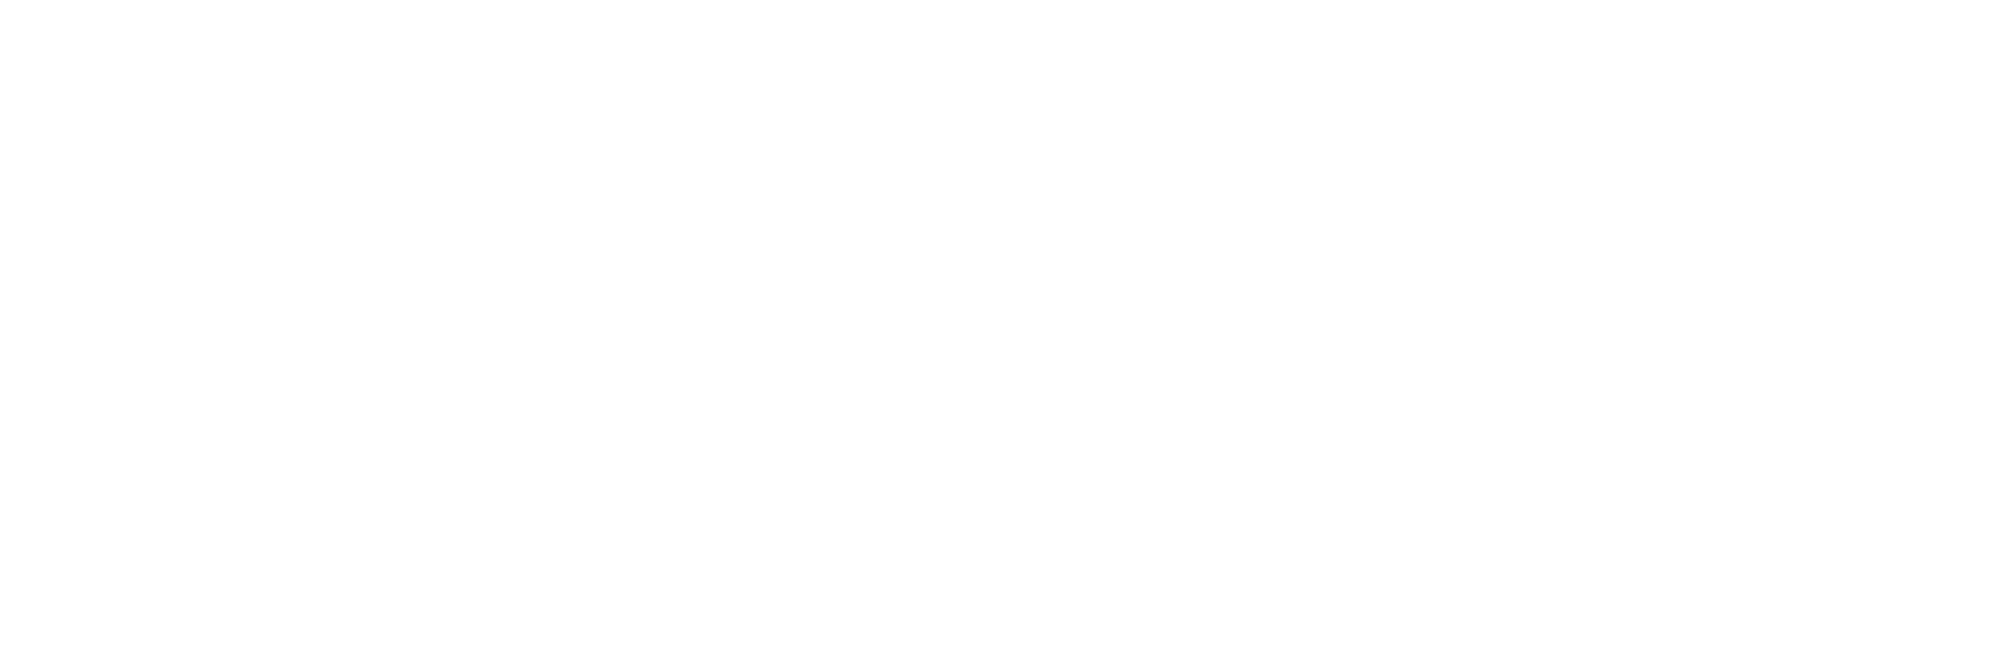 Louise Adby